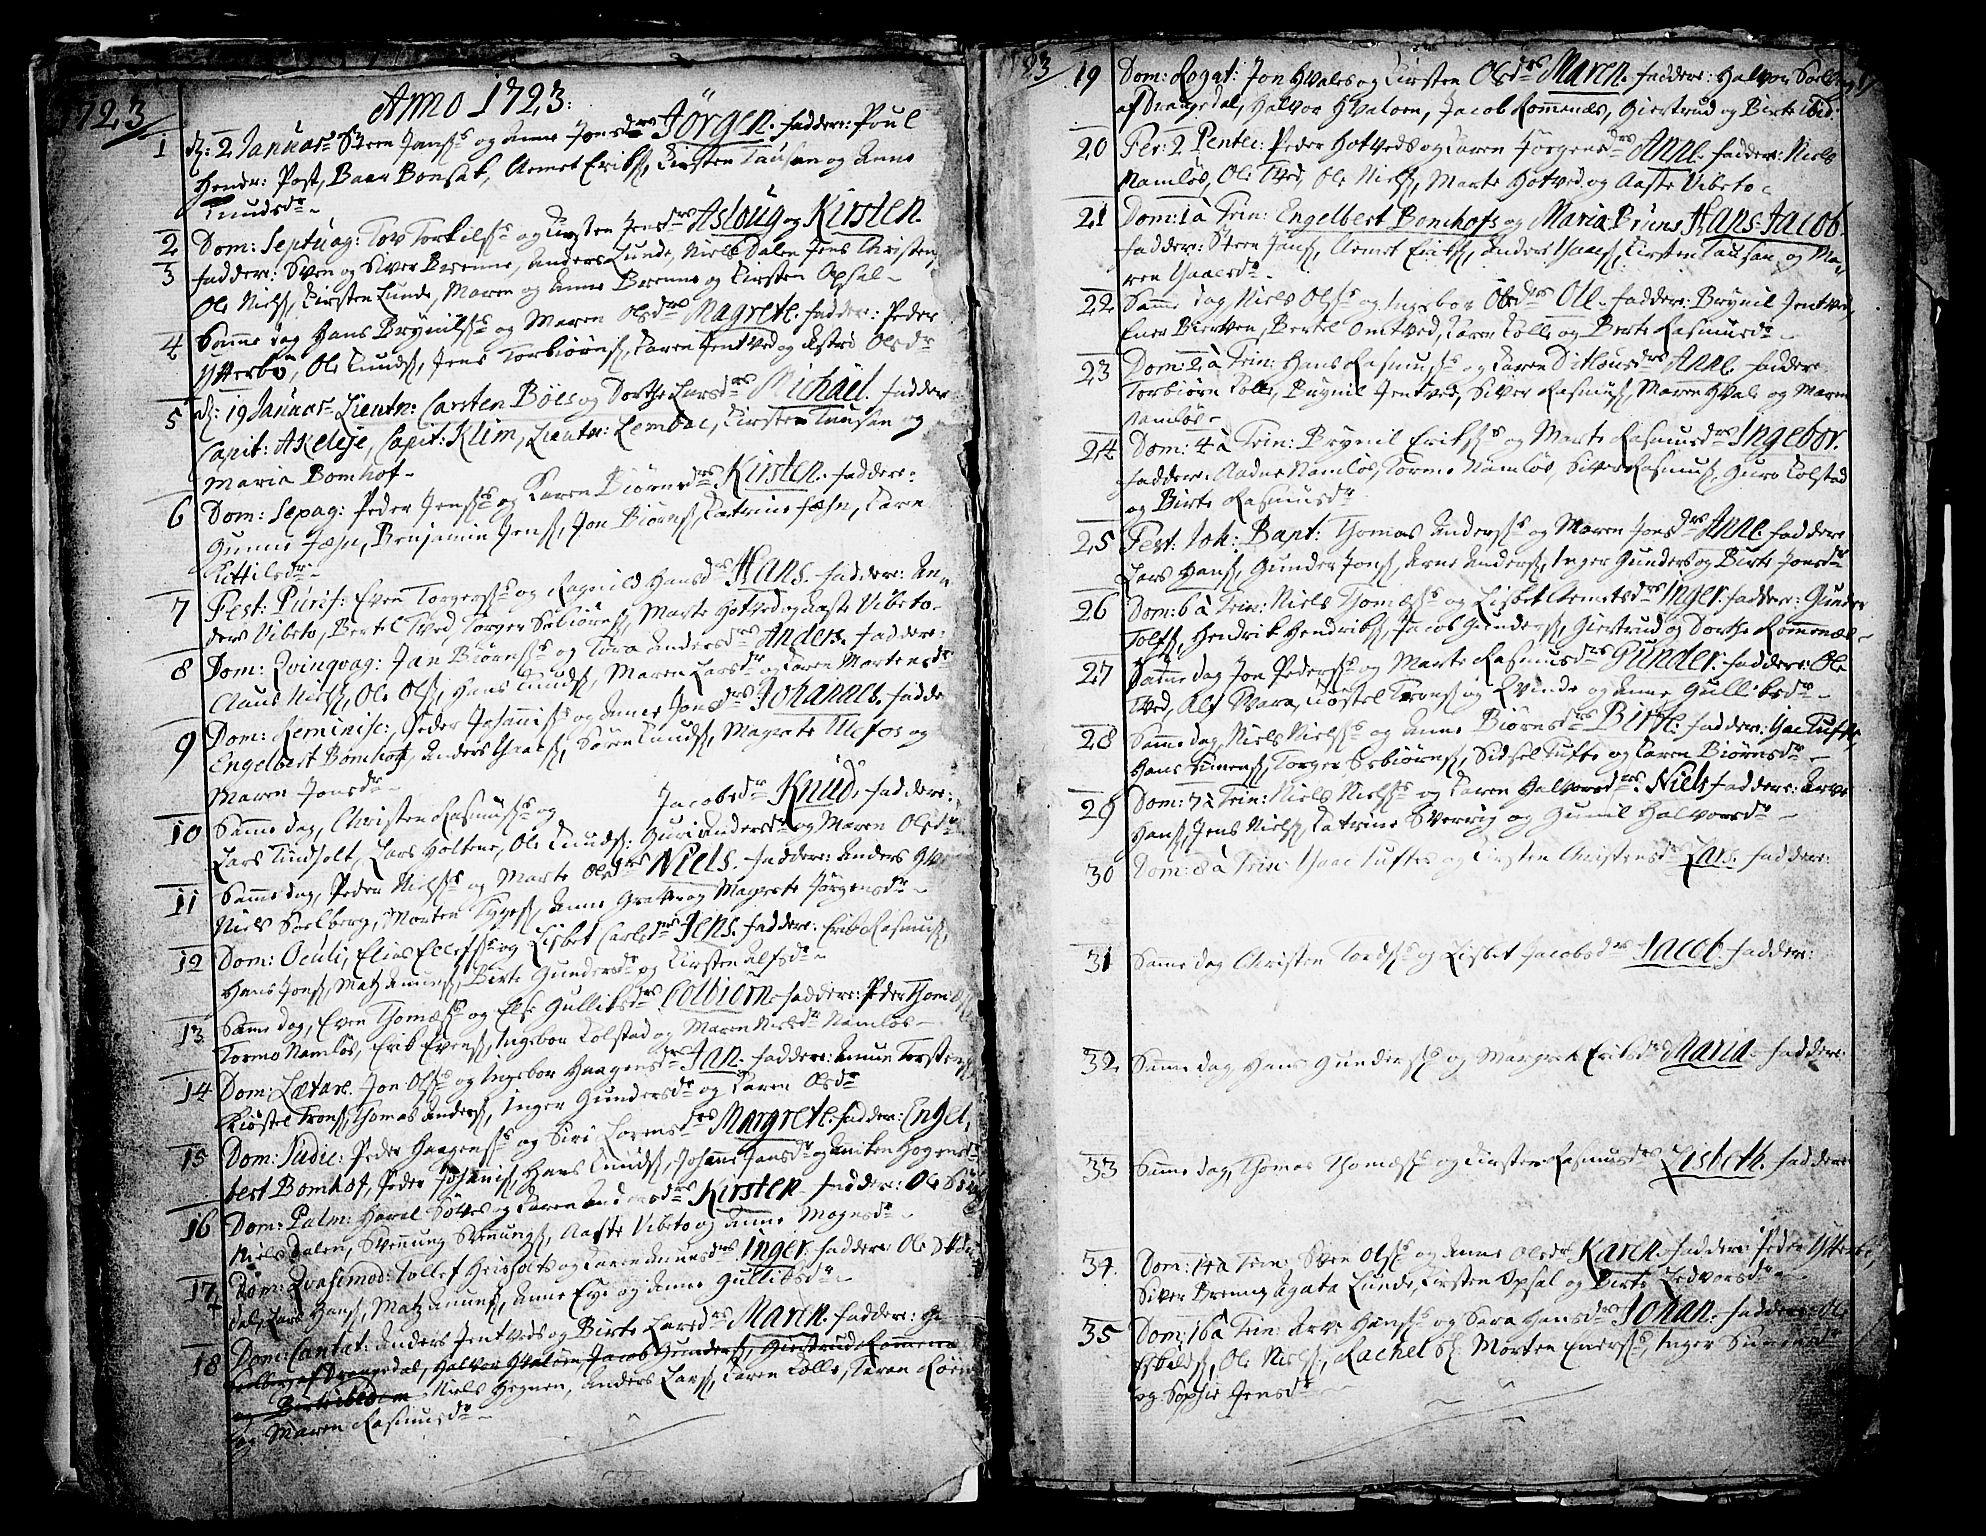 SAKO, Holla kirkebøker, F/Fa/L0001: Ministerialbok nr. 1, 1717-1779, s. 9